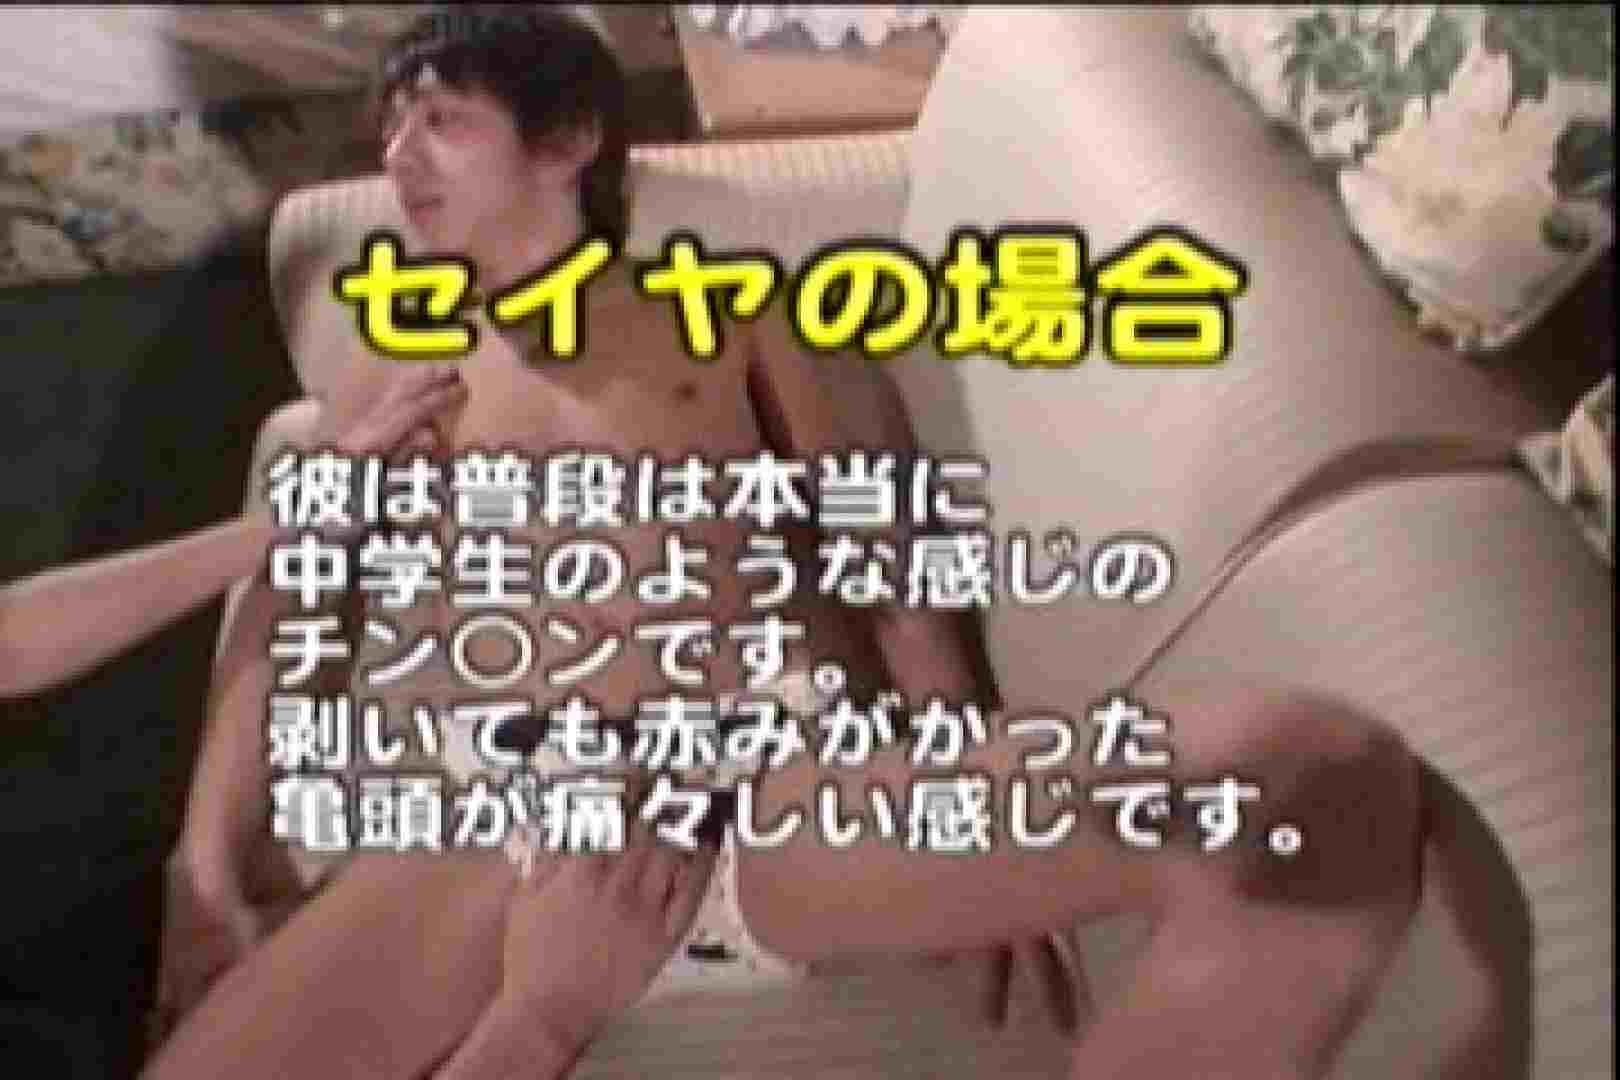 BABY FACEな包茎事情!!4FACEの快楽 射精男 ゲイ無料エロ画像 108画像 29